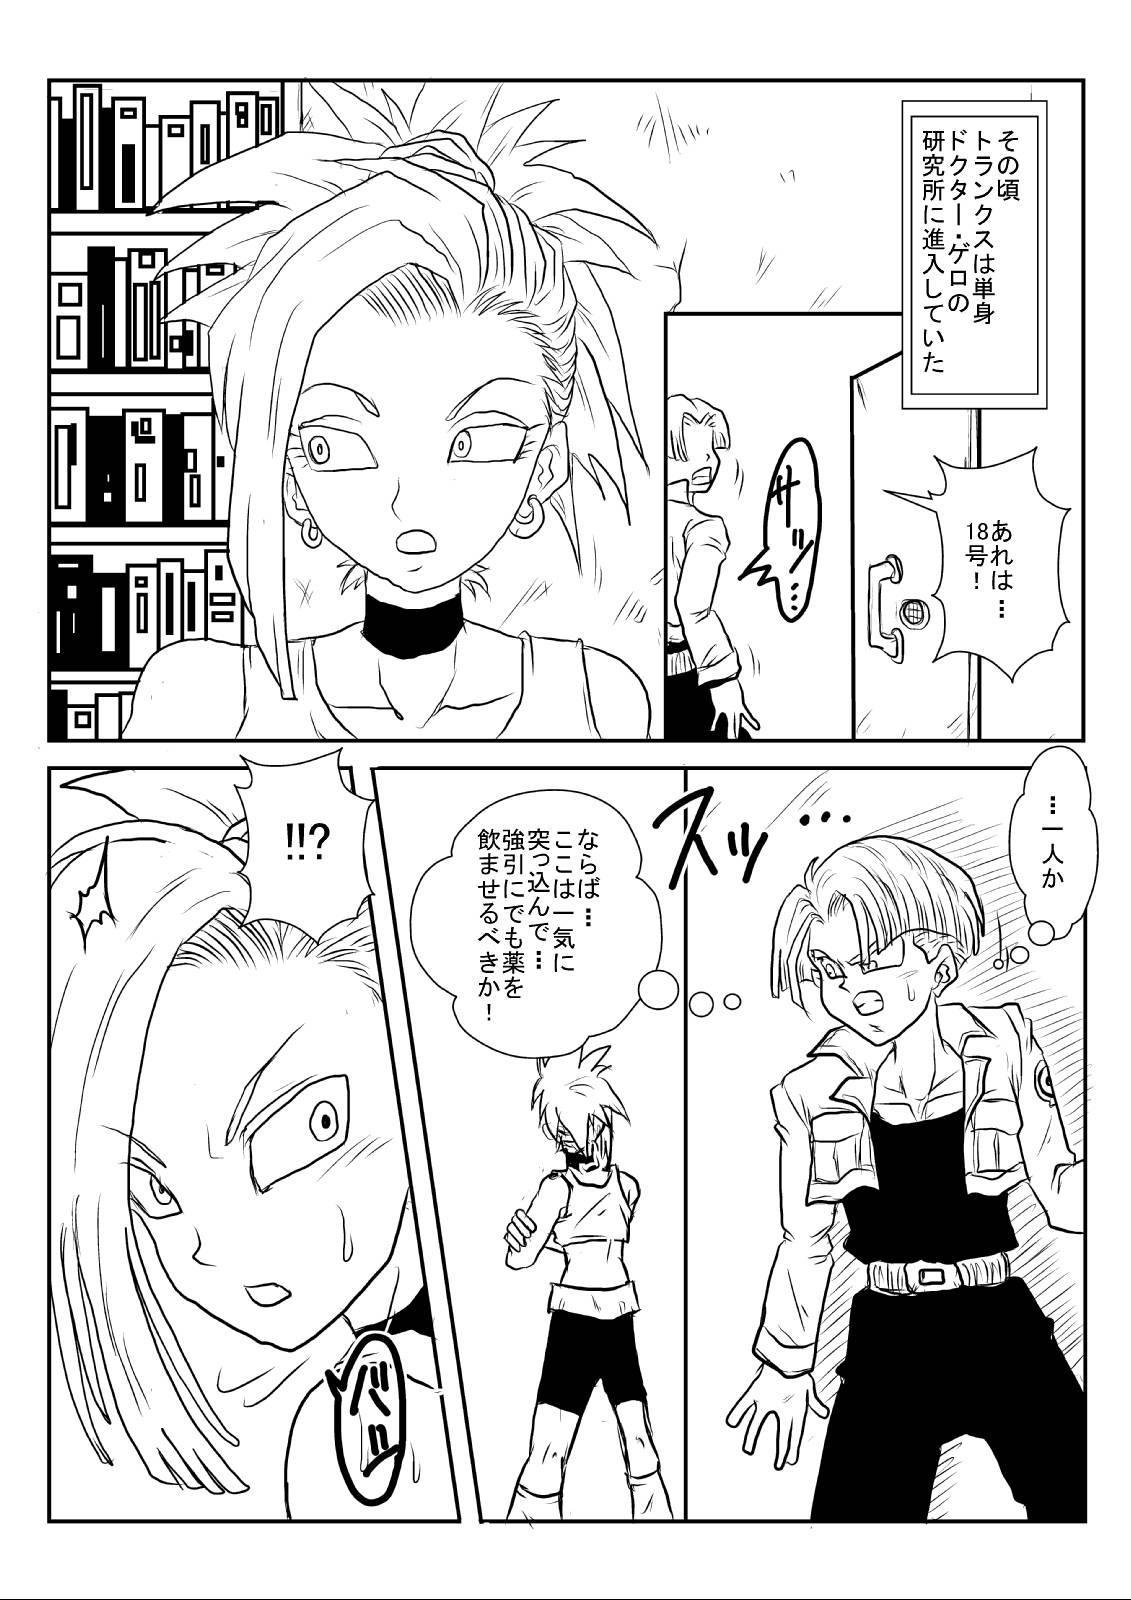 [Alice.Blood] Sennou Kyouiku-shitsu~ Jinzou ☆-kan 18-gou-hen (Dragon Ball Z) 19